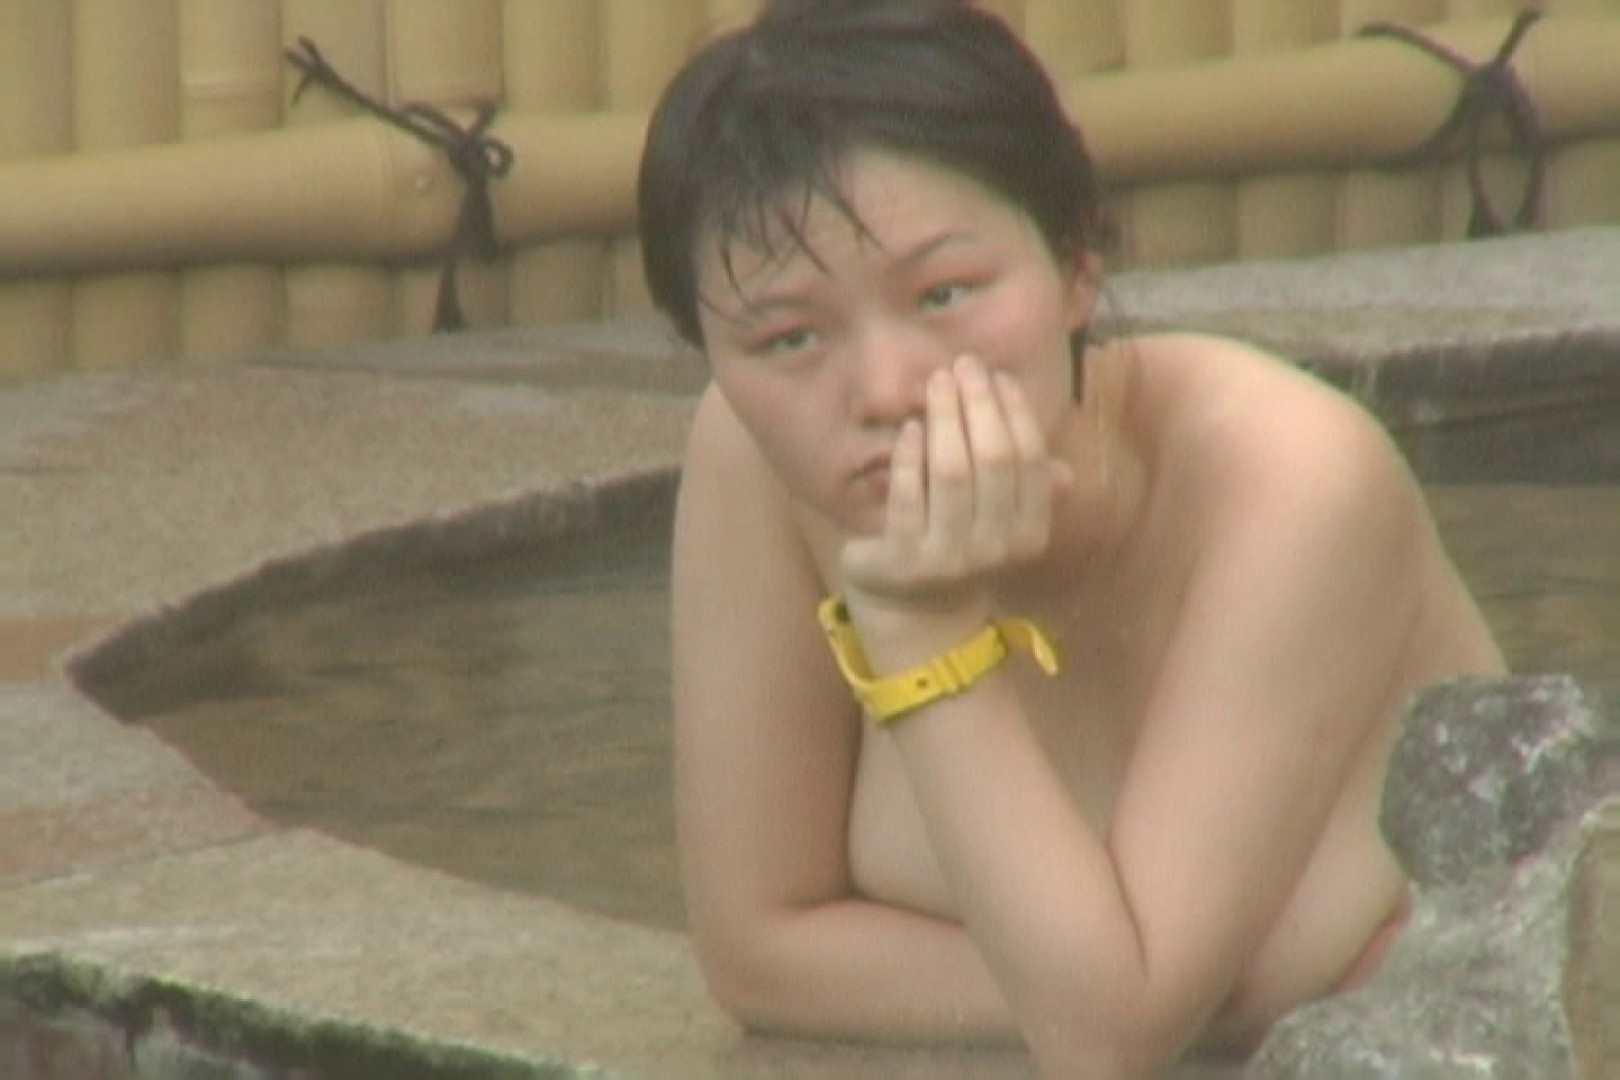 Aquaな露天風呂Vol.116 盗撮映像  42Pix 11